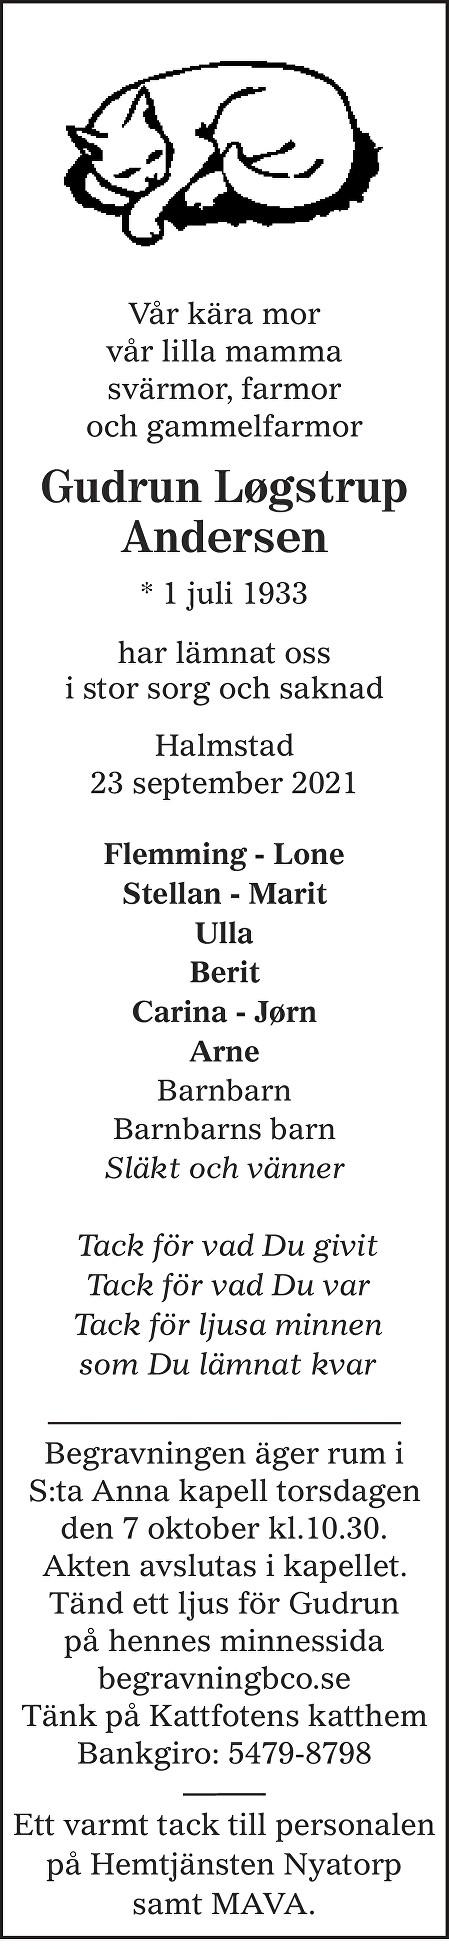 Gudrun Løgstrup Andersen Death notice